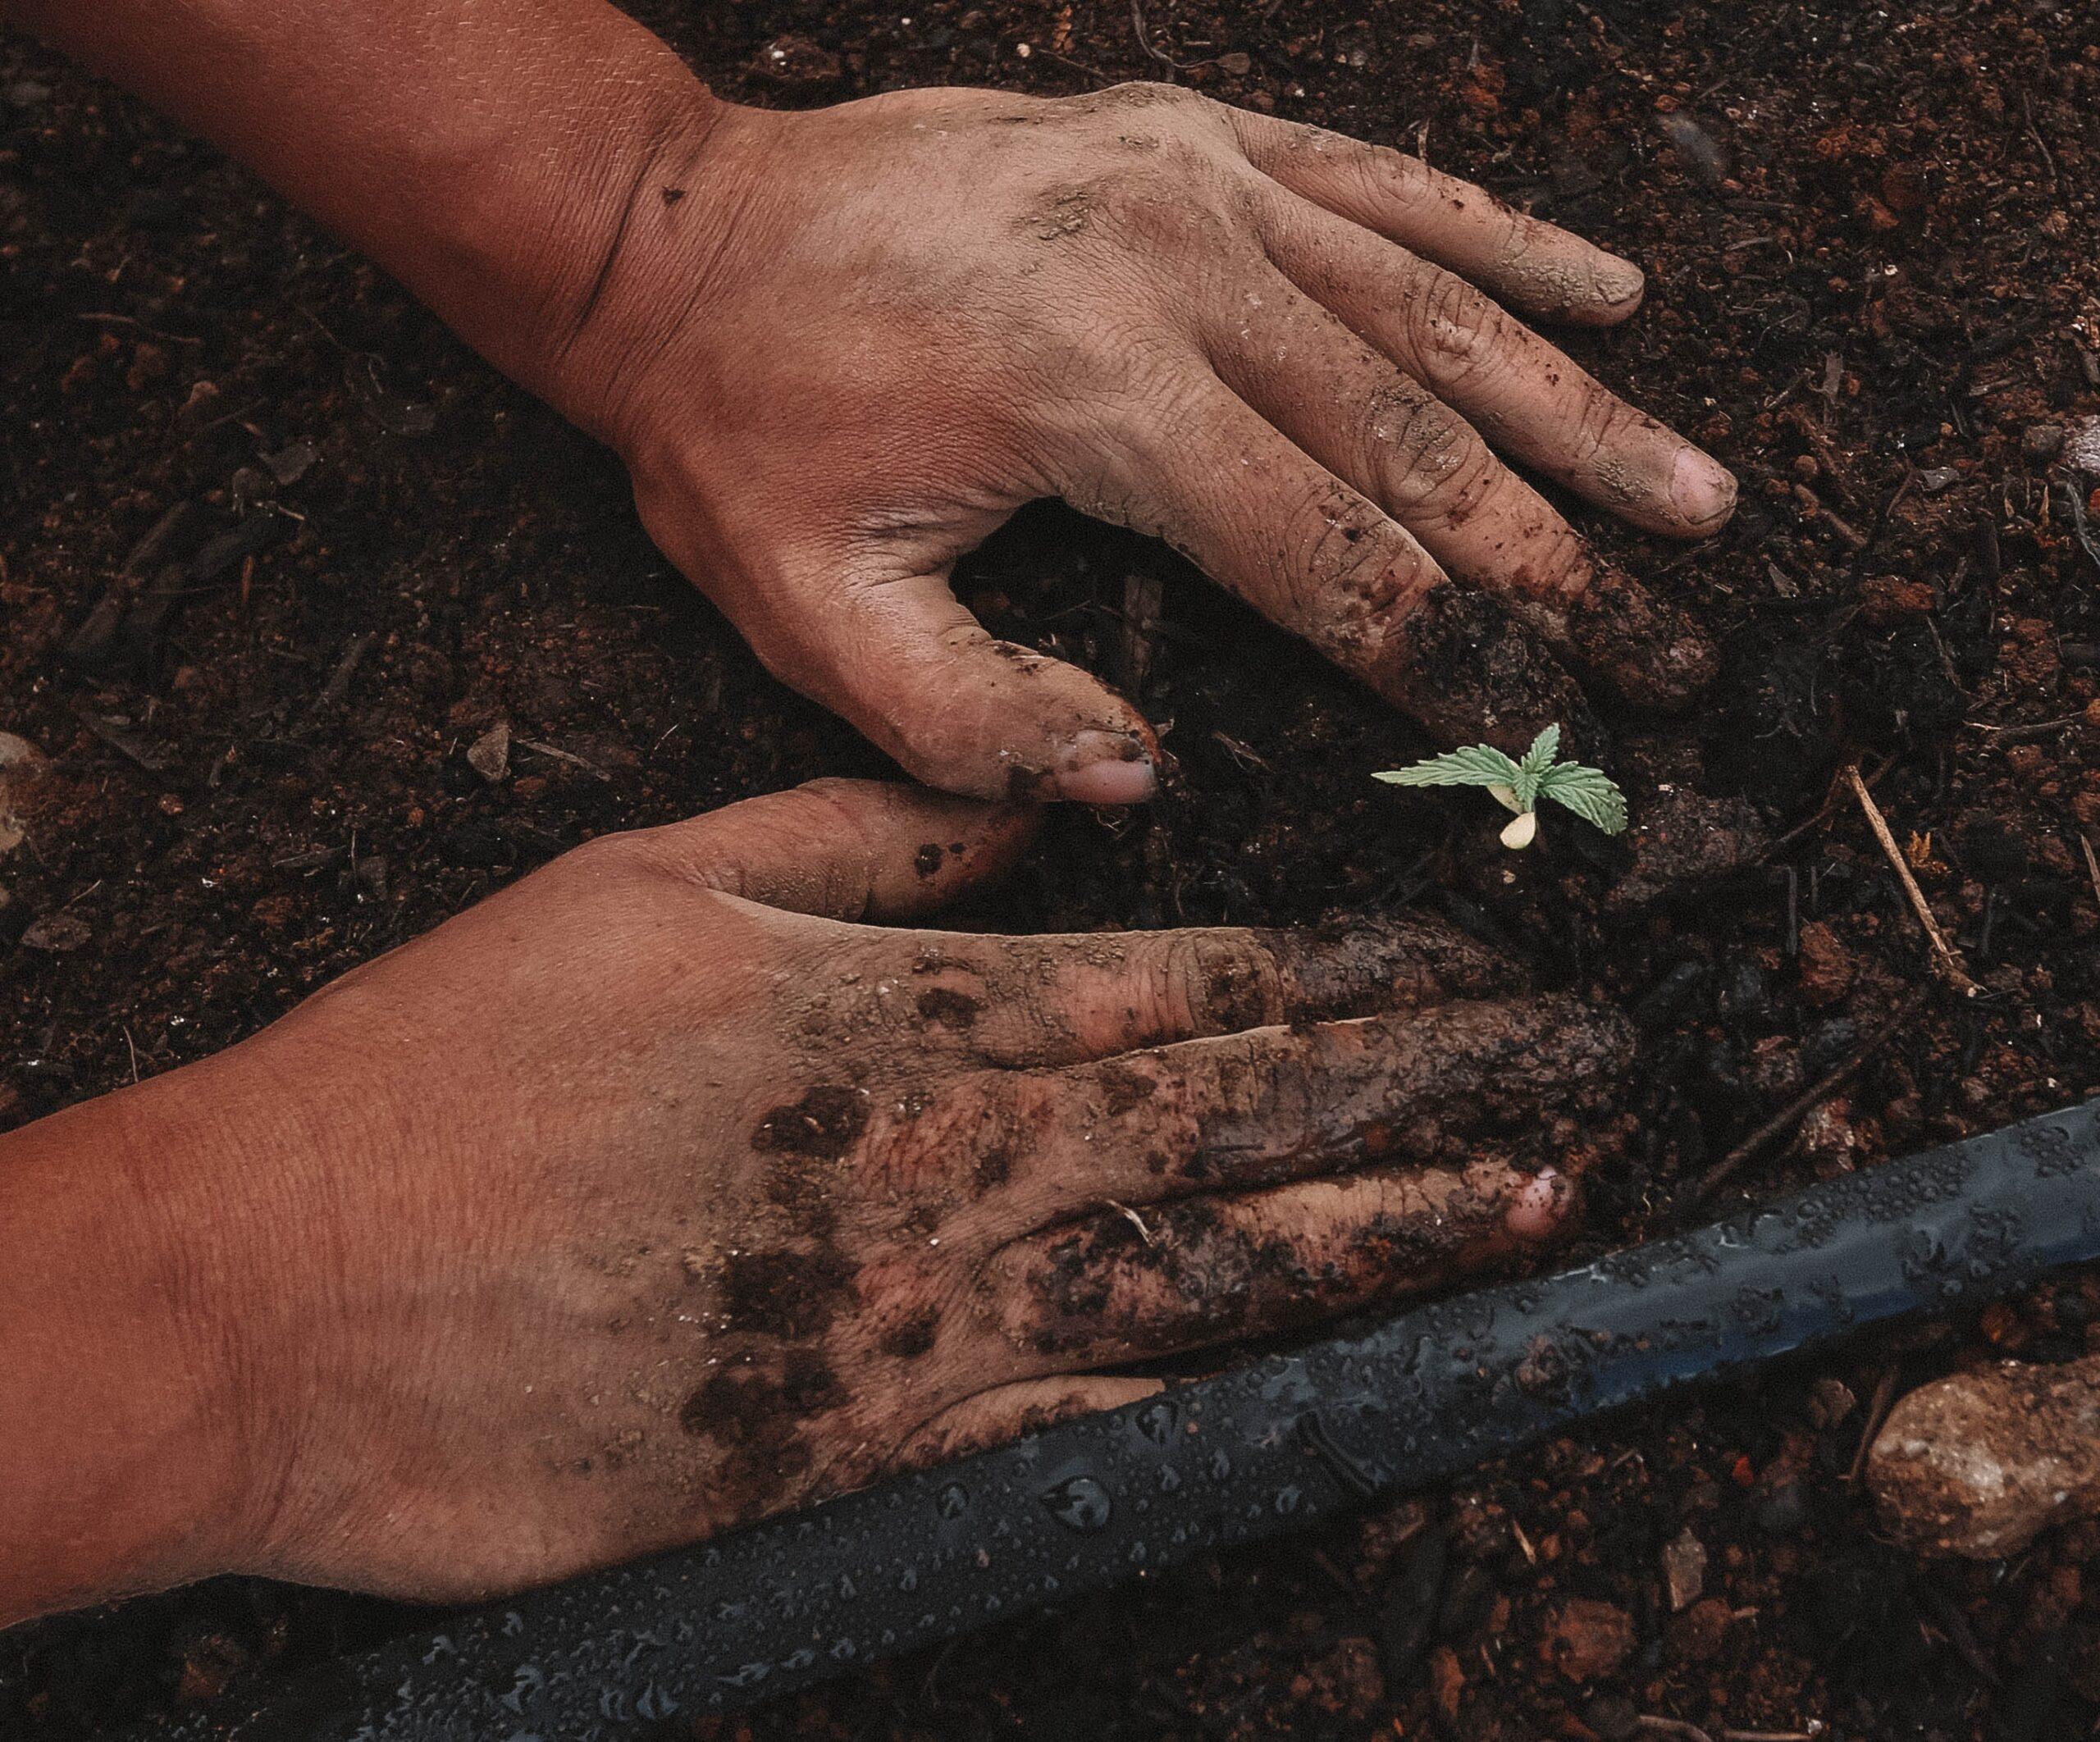 Hands in soil planting hemp plant